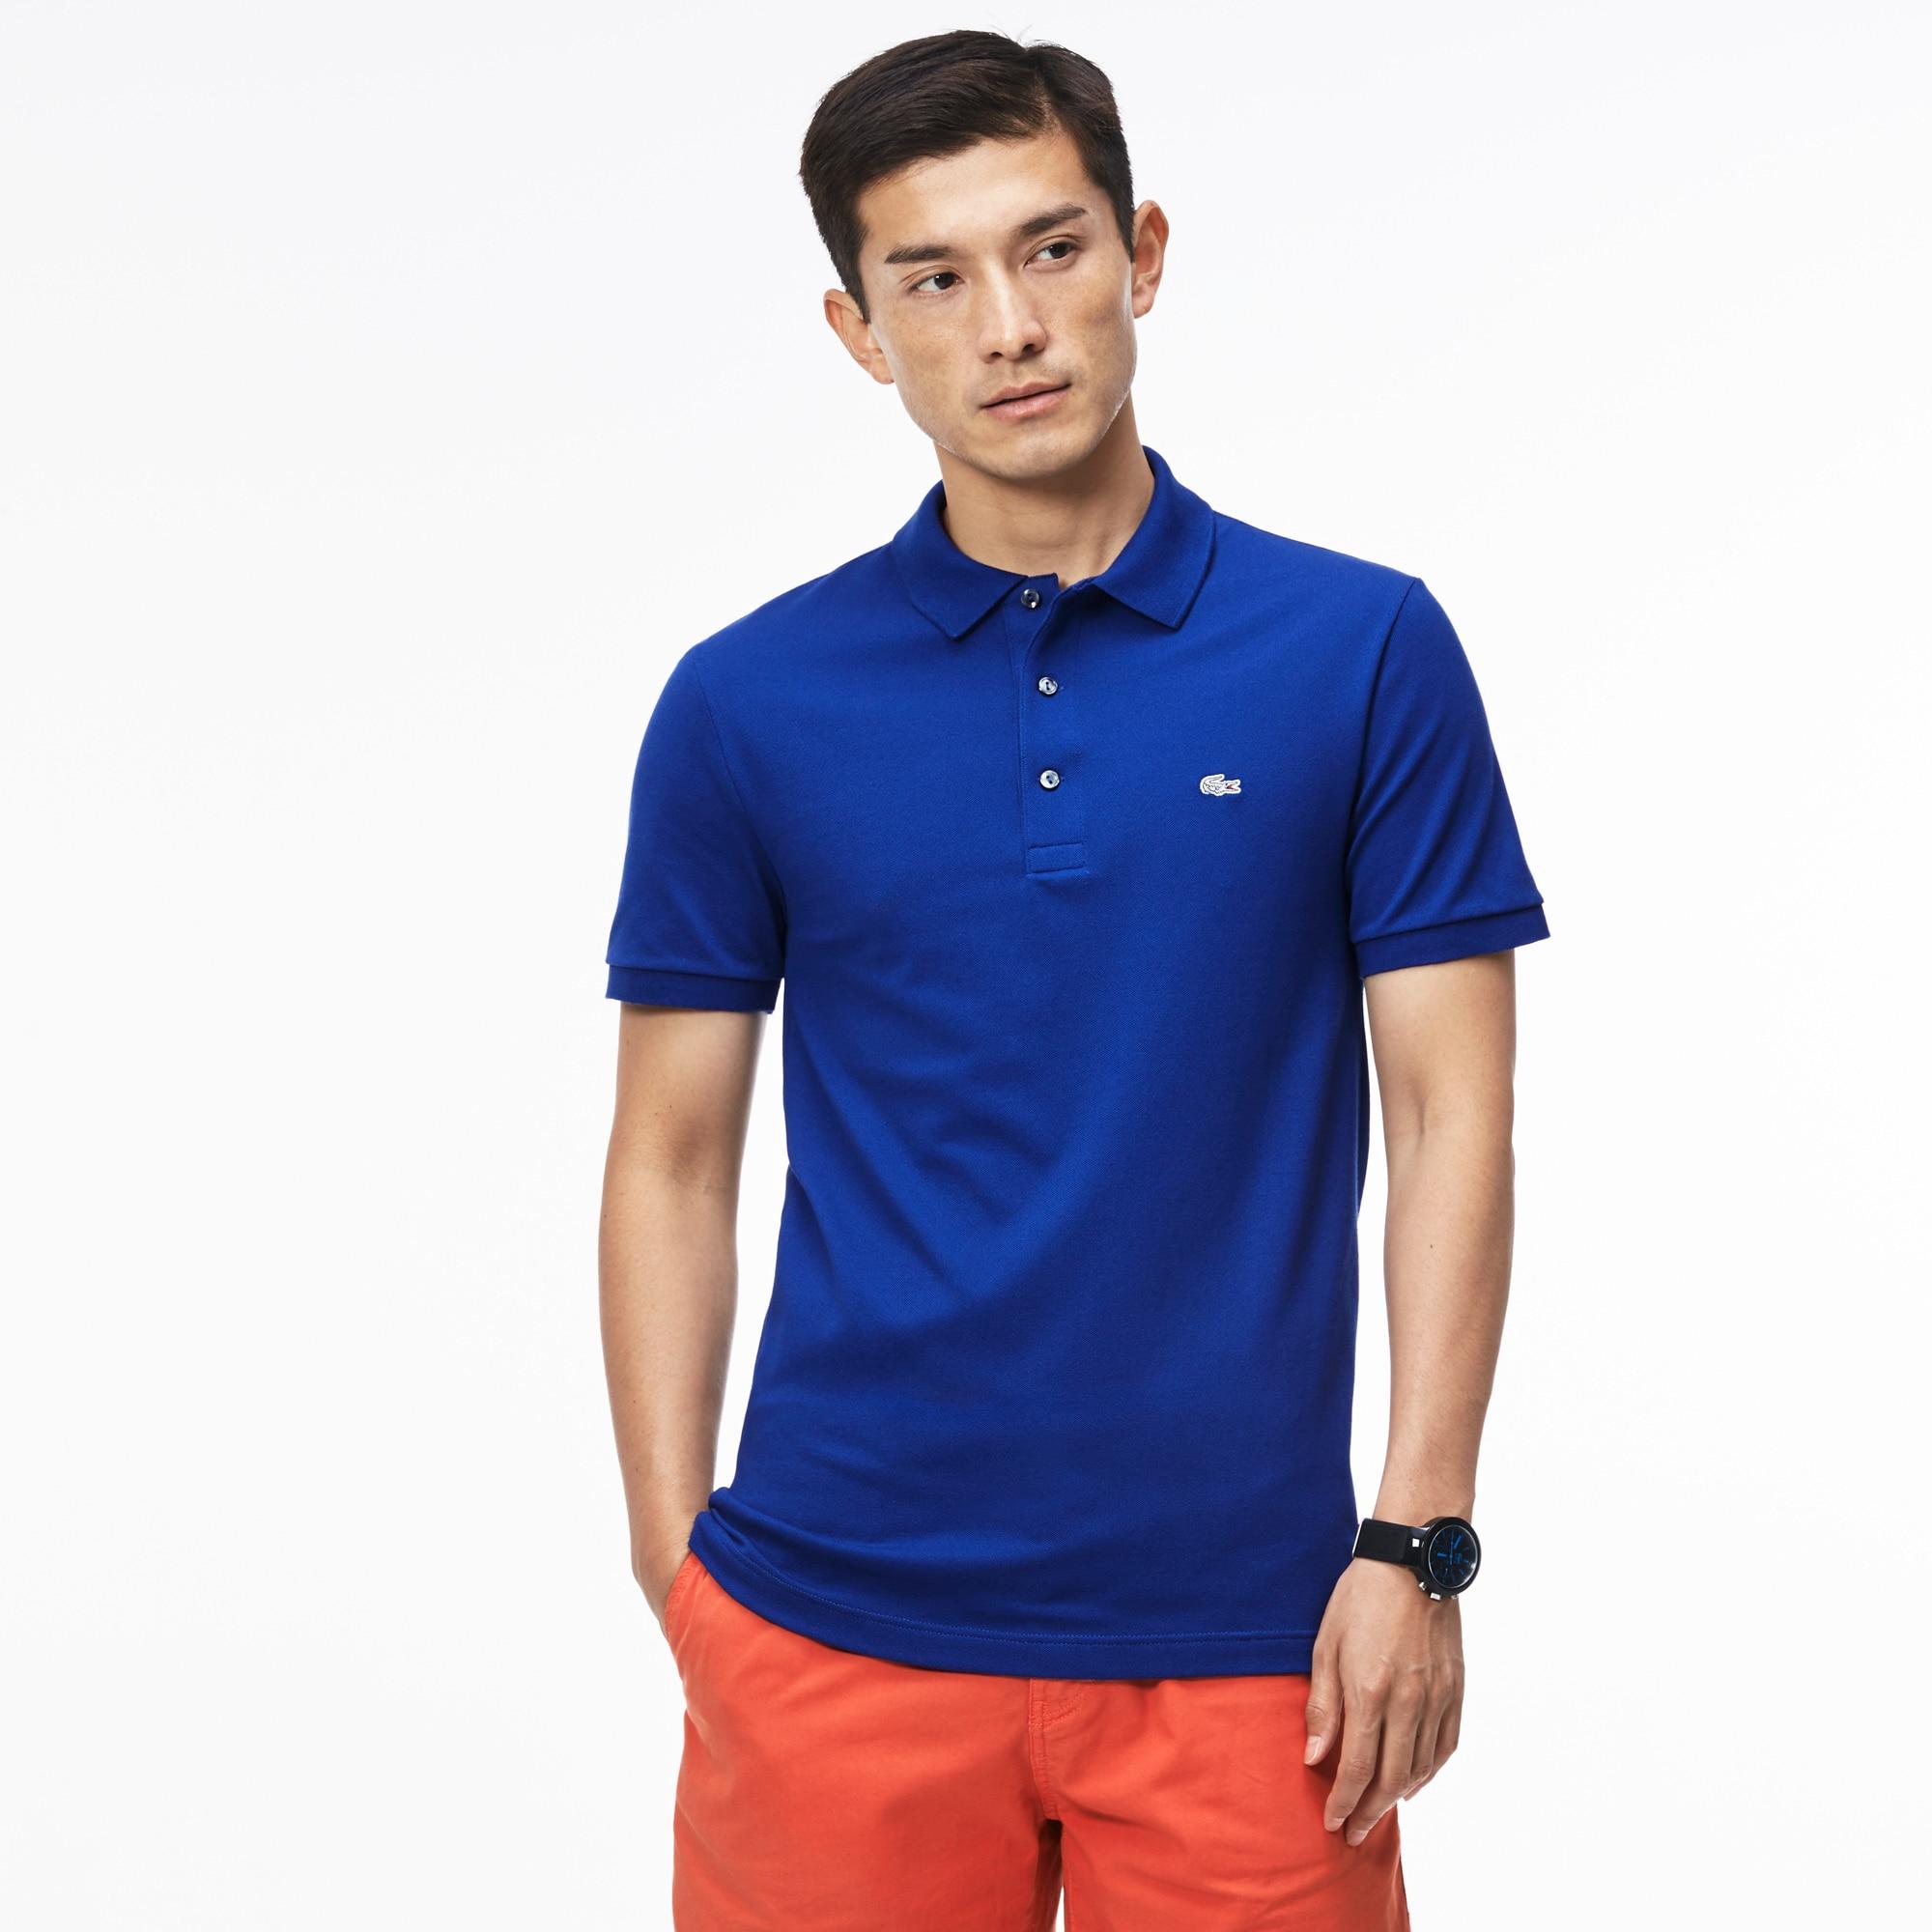 Lacoste Mens Polo Shirt Dark Blue